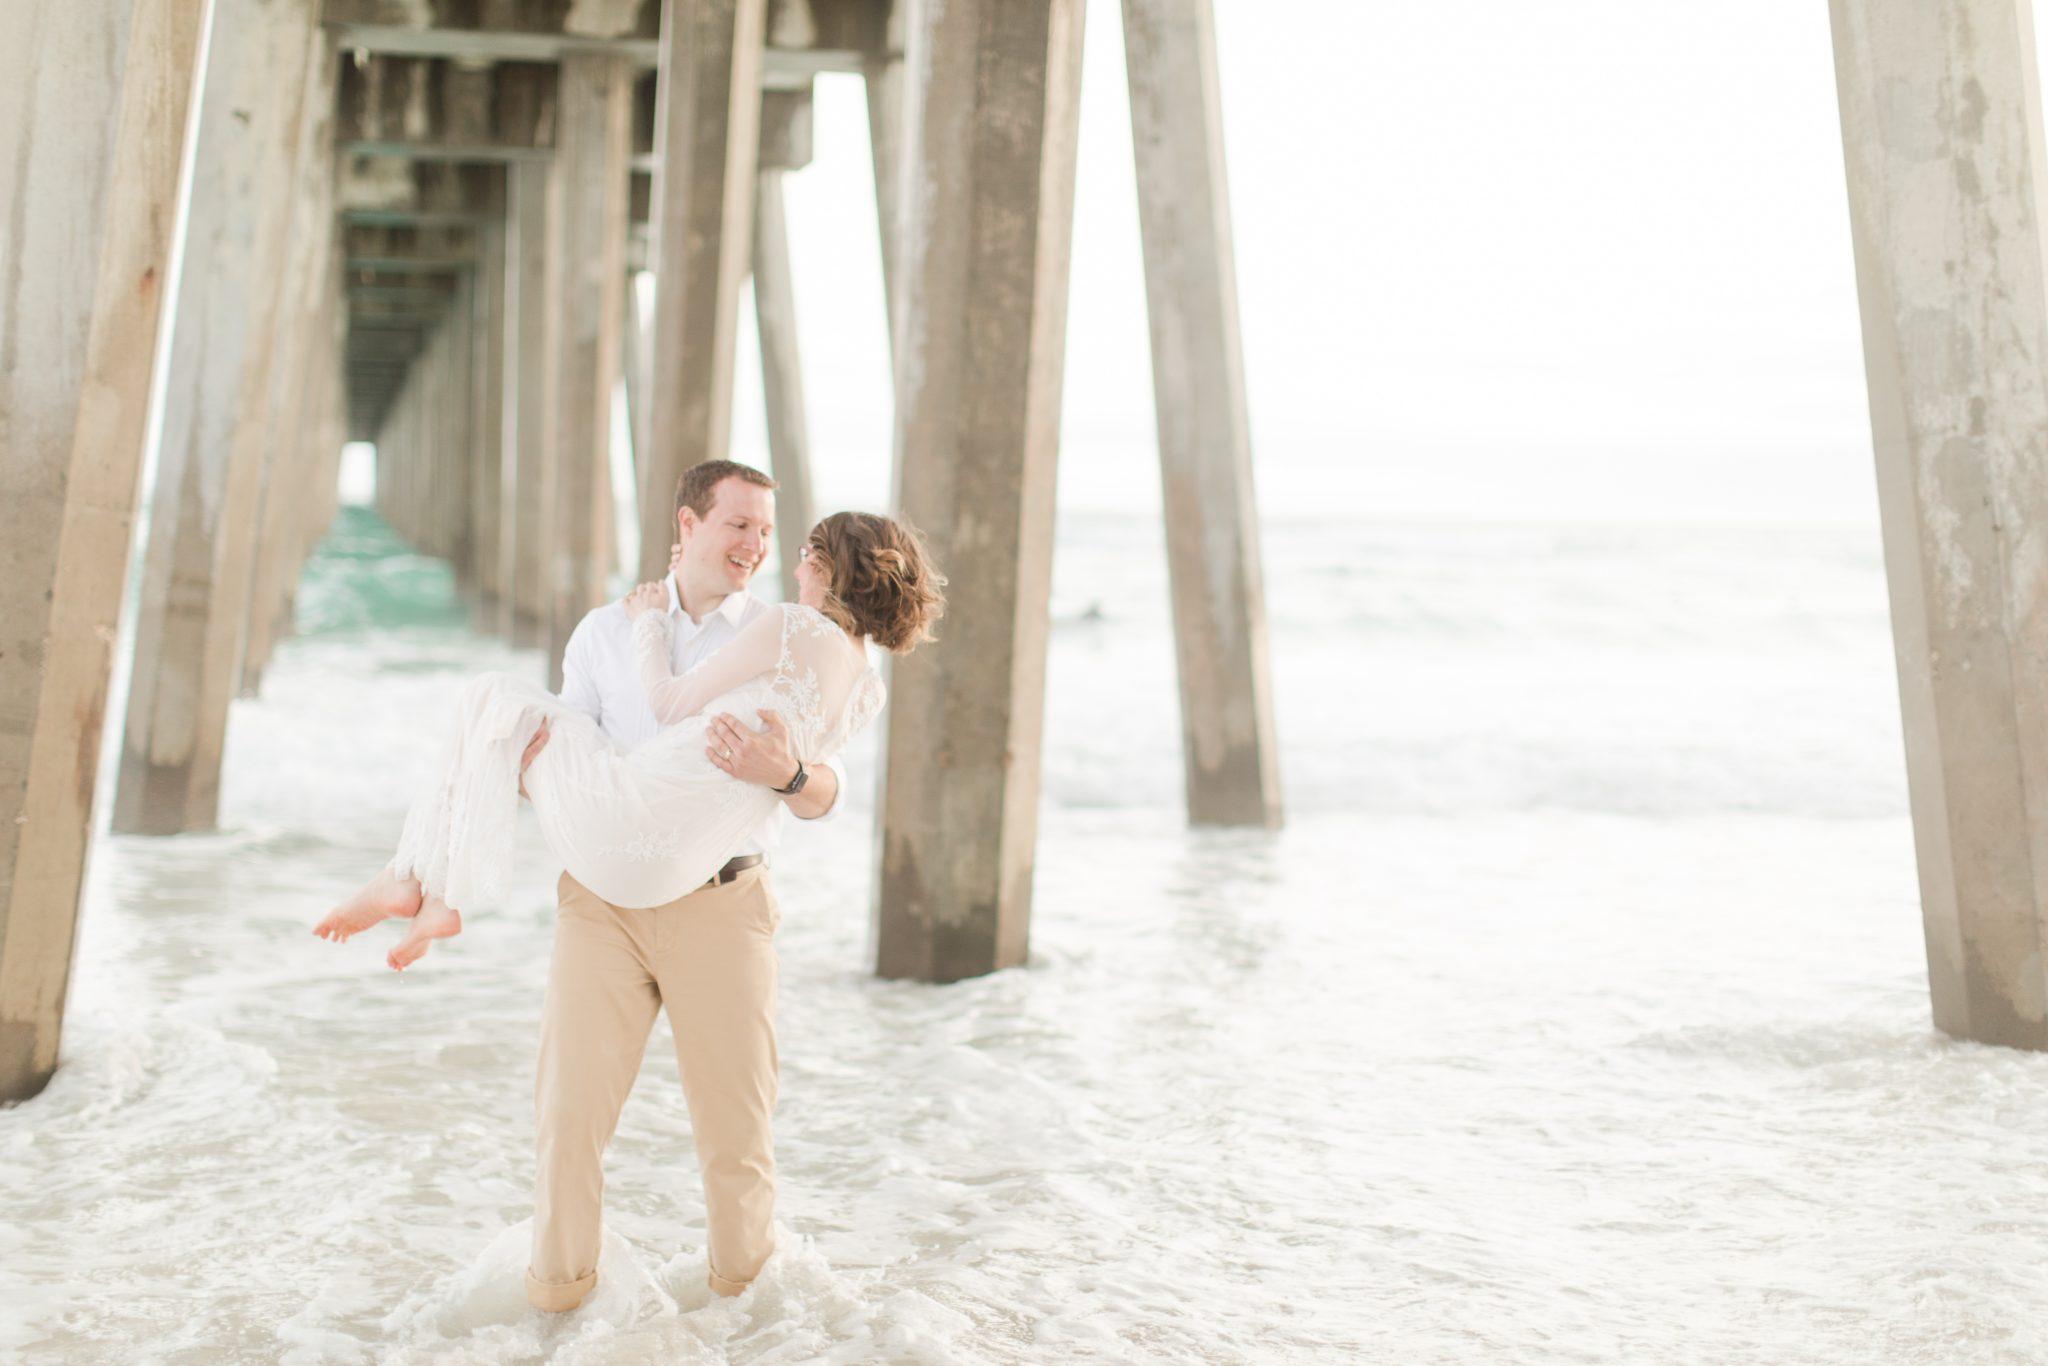 Pensacola Florida Wedding and Engagement Photographer- Neil and Steph-199